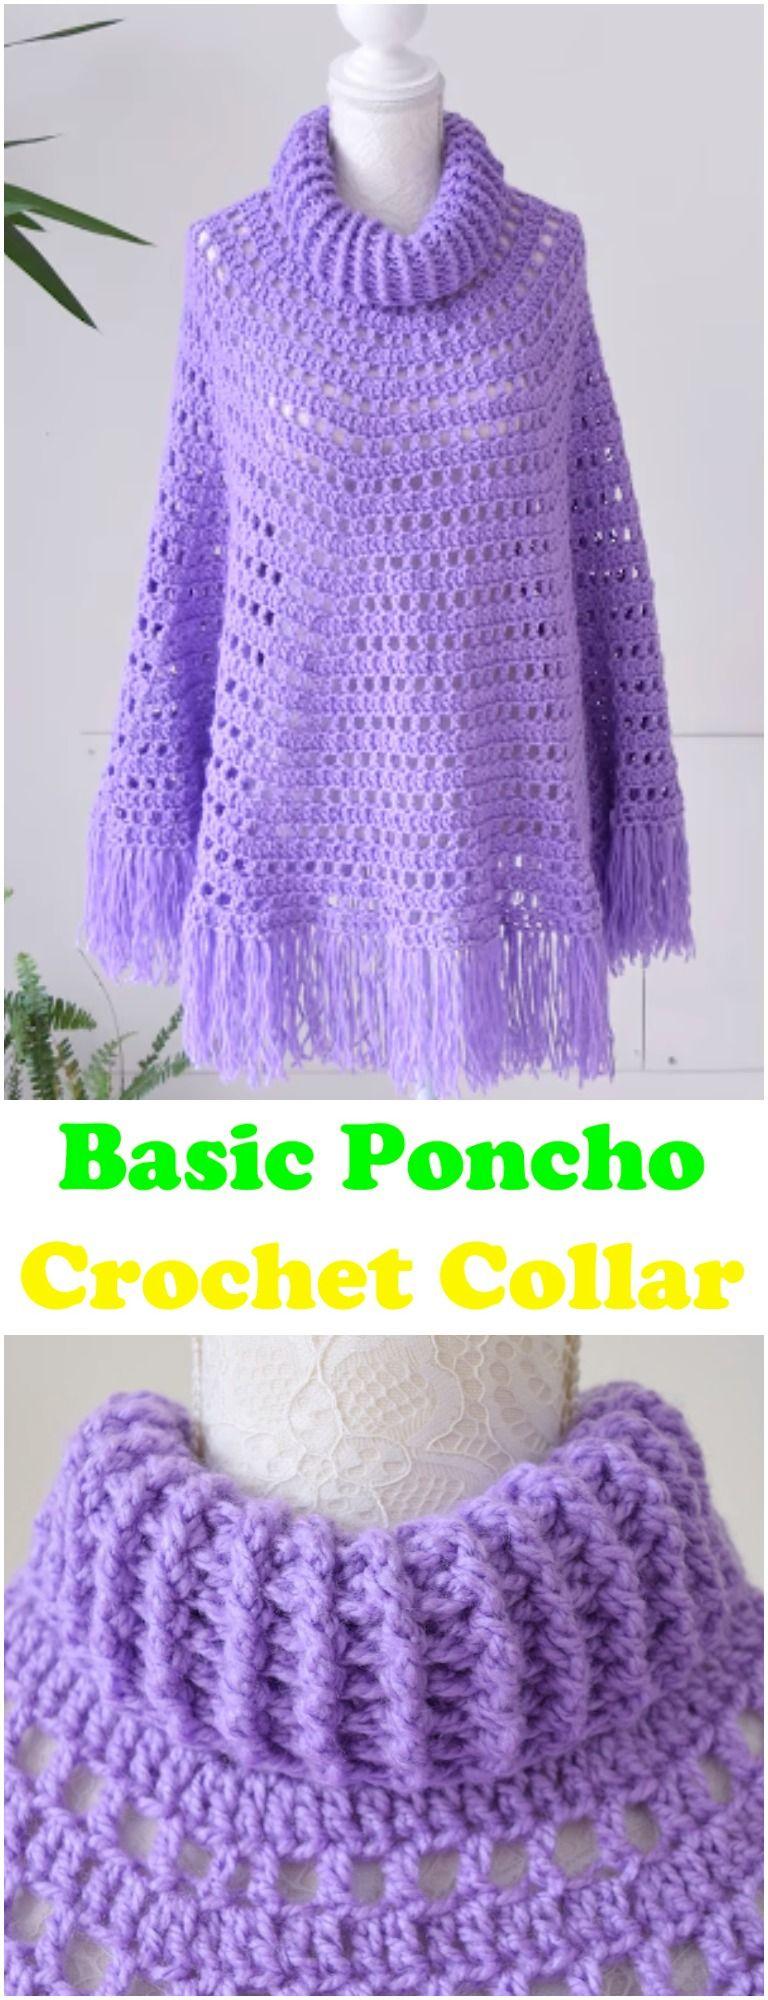 Learn To Crochet Basic Poncho With Crochet Collar | Crochet ...